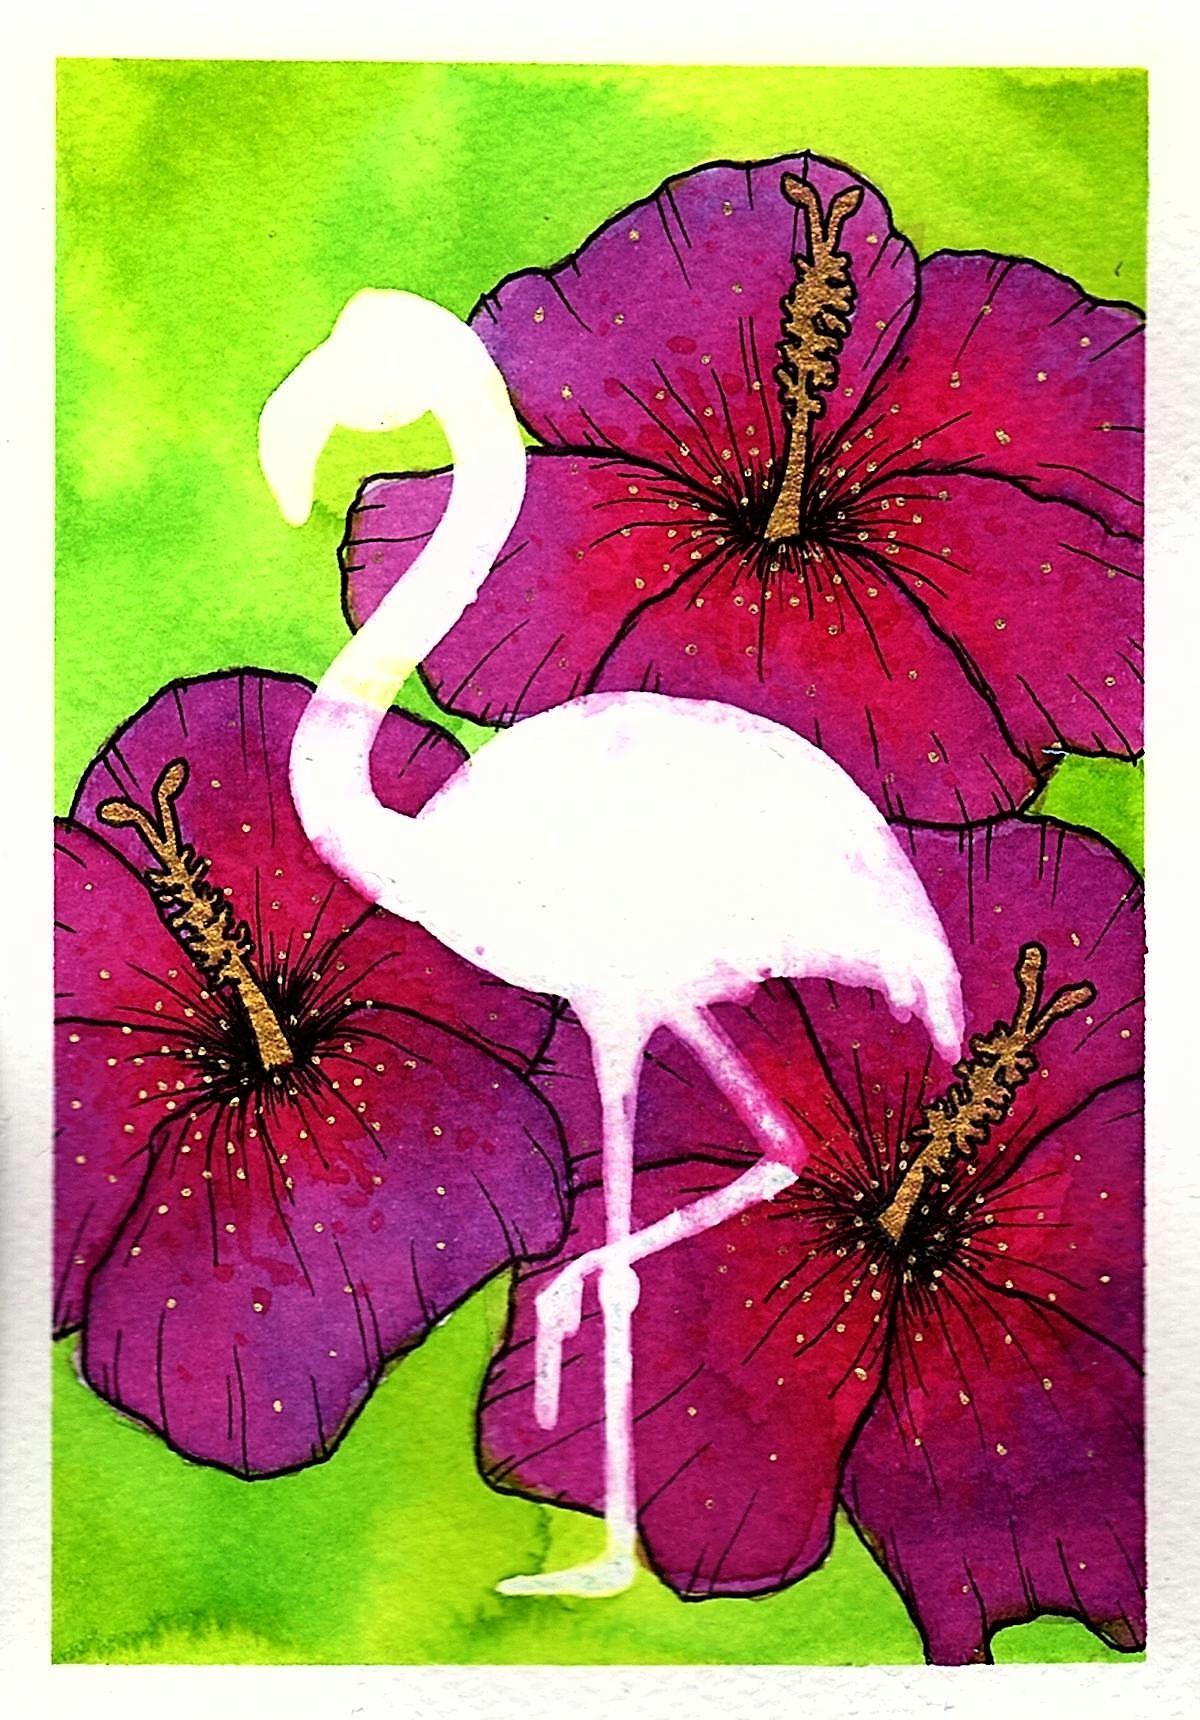 FlamingoHibiscusScan.jpg